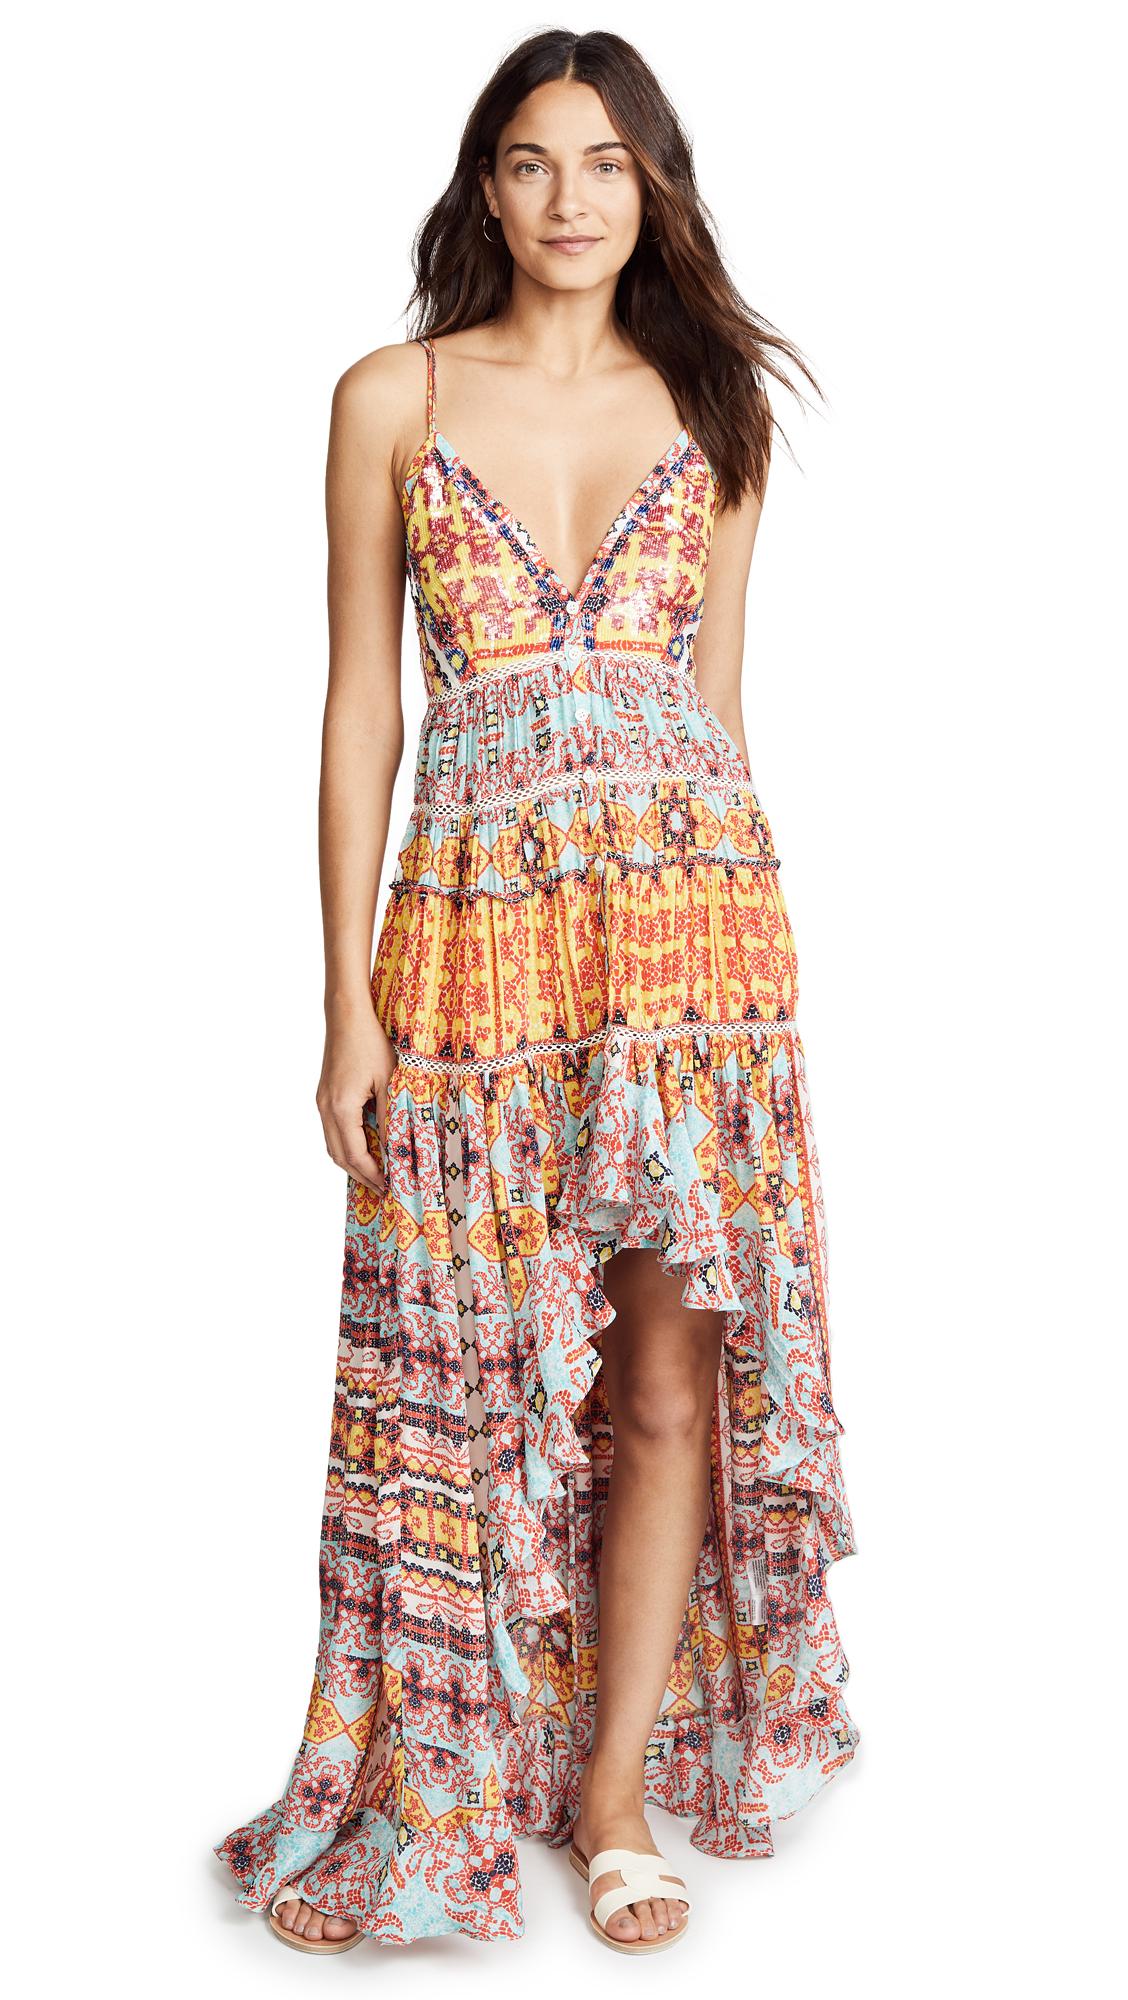 Rococo Sand TESSELATE LONG DRESS